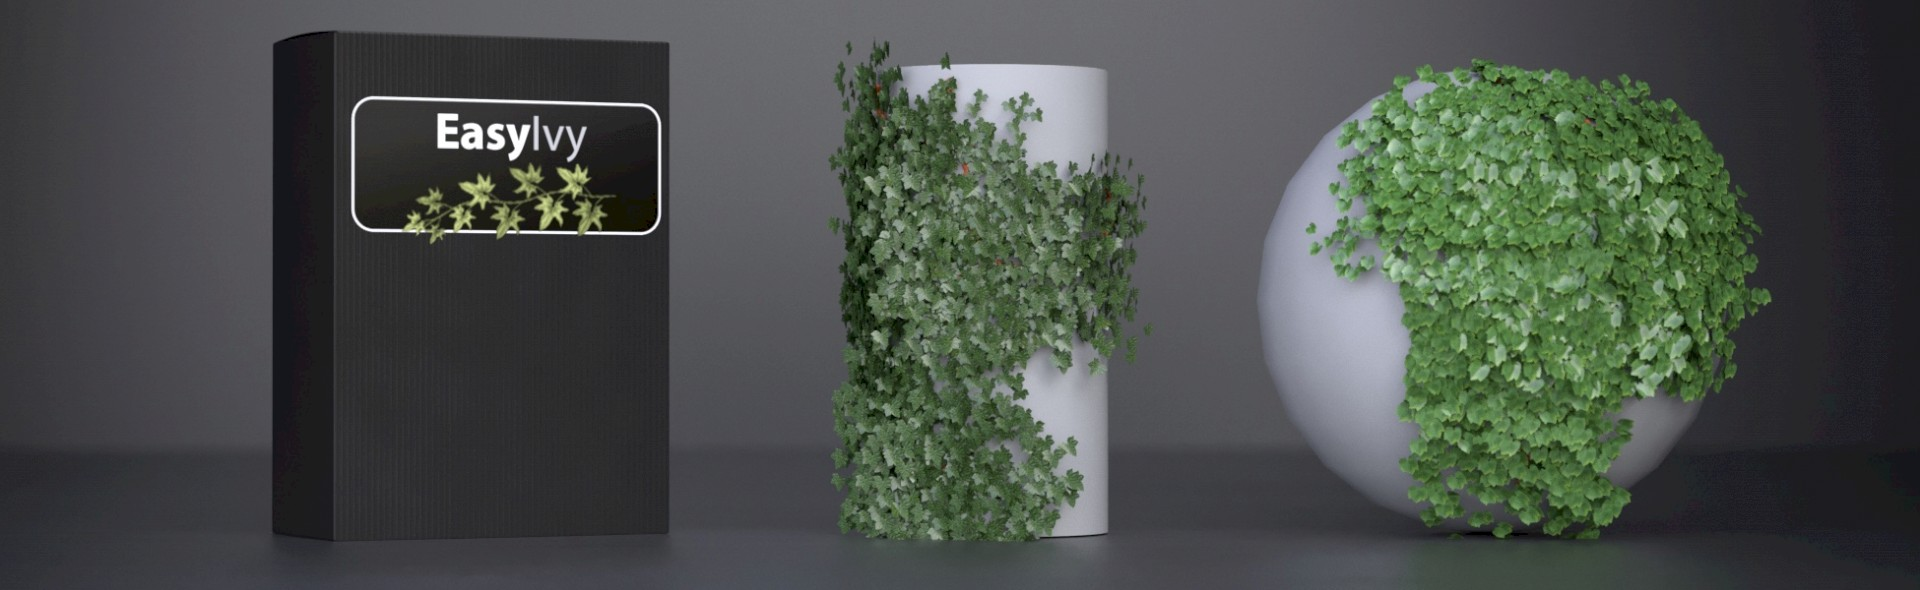 Easy Ivy 1 0 1 - Plug-ins - Shop - C4Dzone